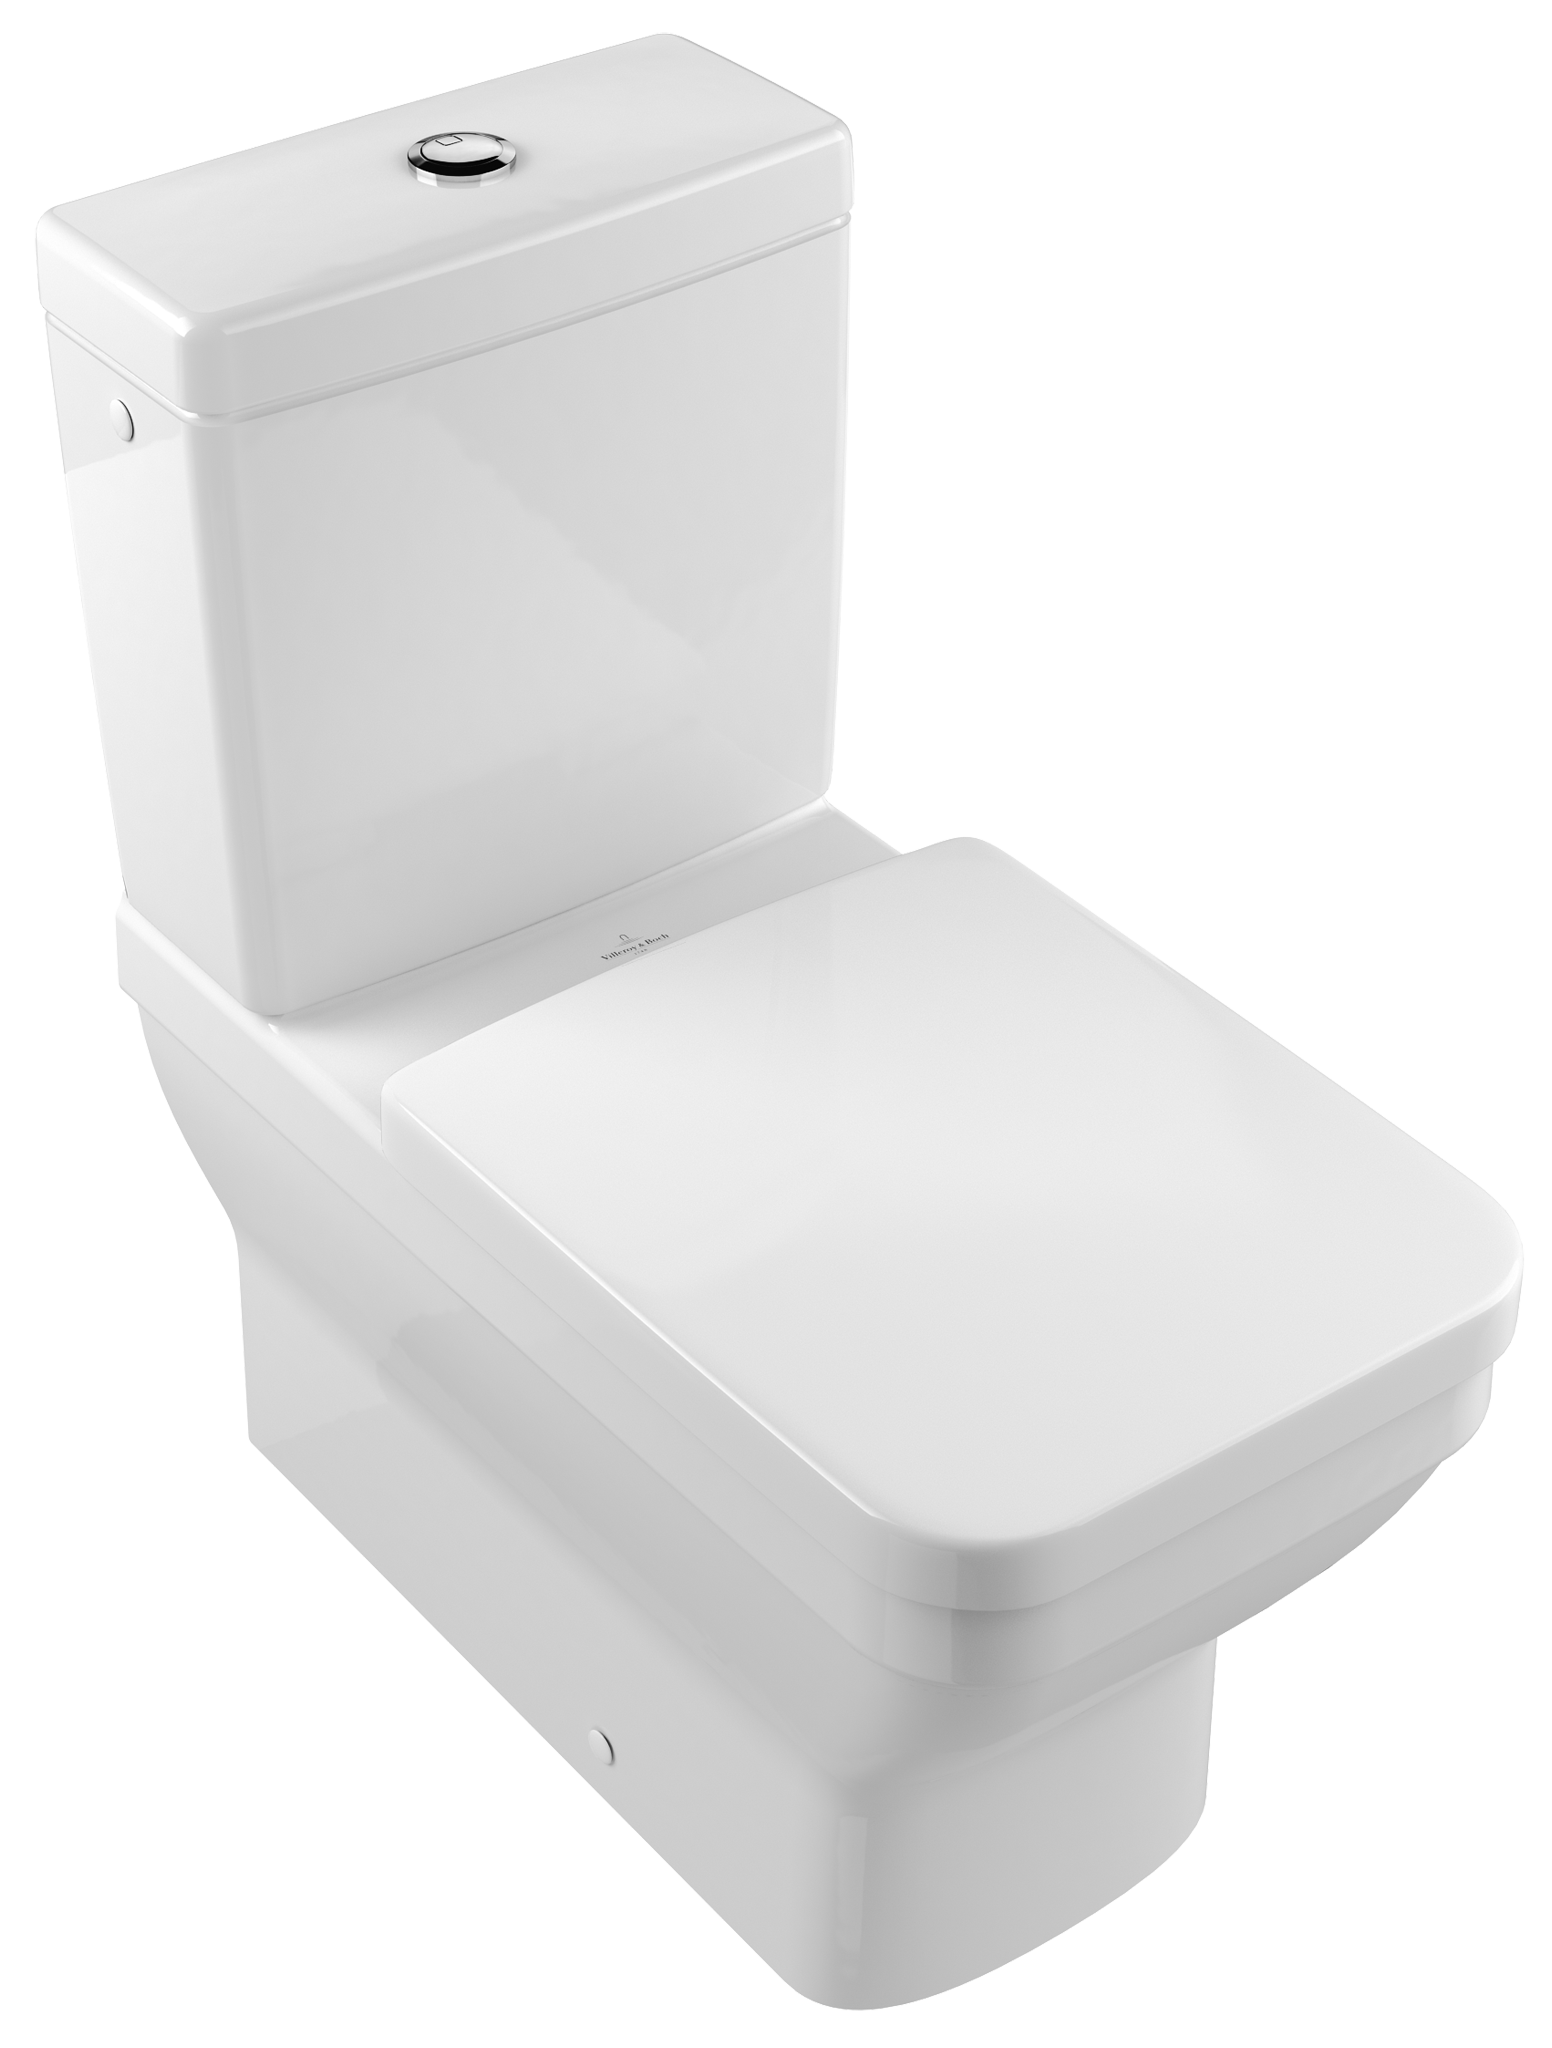 Badewanne Dusche Kombination Villeroy : Floor Set Back Outlet Toilet Fitting